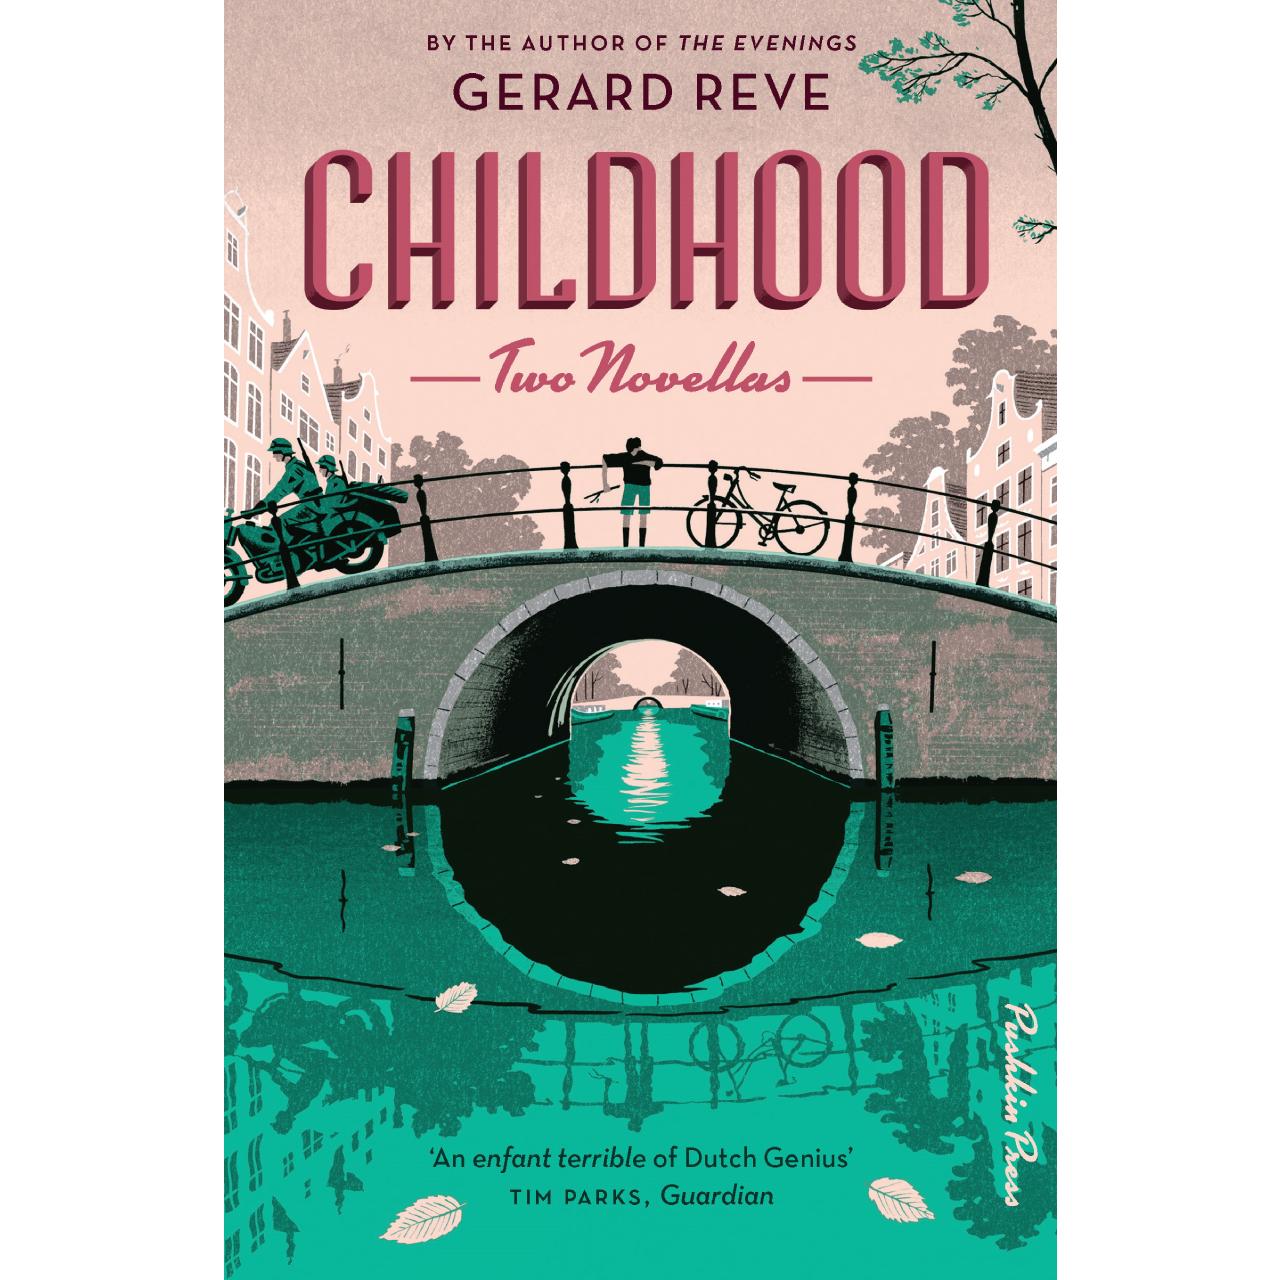 CHILDHOOD - by Gerard Revetranslated by Sam GarrettPushkin Press